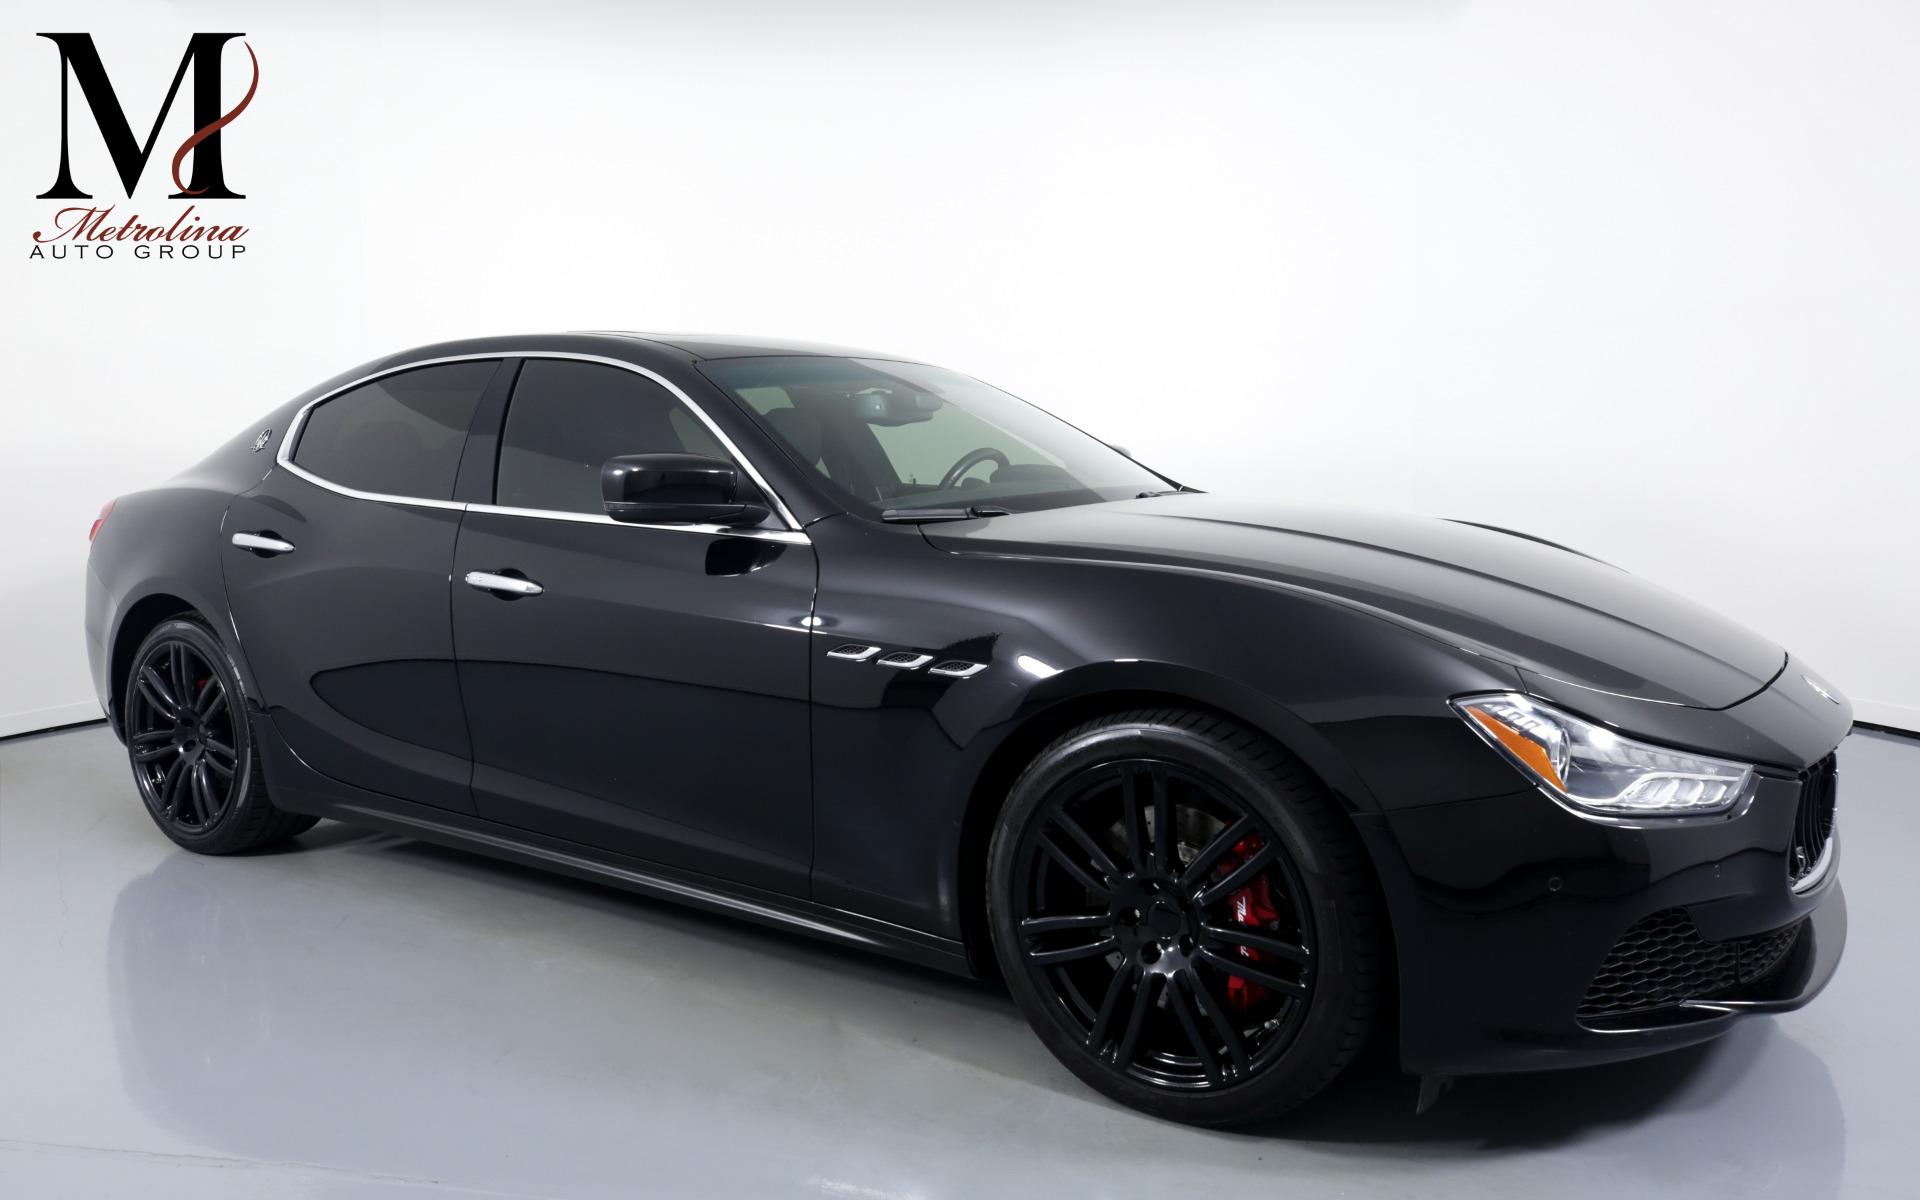 Used 2015 Maserati Ghibli S Q4 for sale $29,996 at Metrolina Auto Group in Charlotte NC 28217 - 1